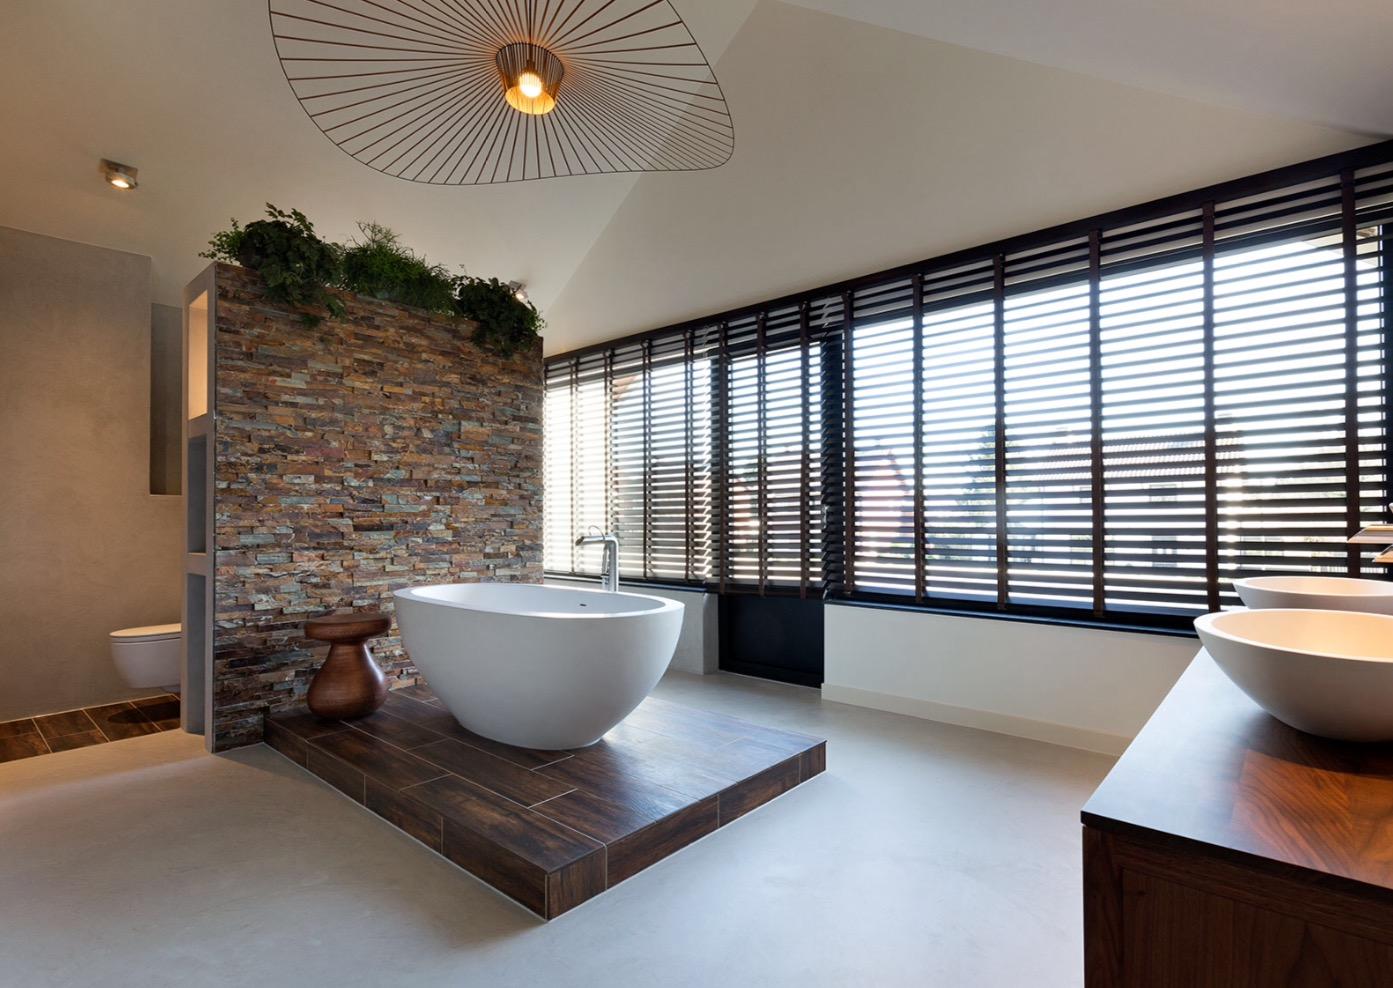 Badkamer Hout Natuursteen : Badkamer natuursteen ecosia